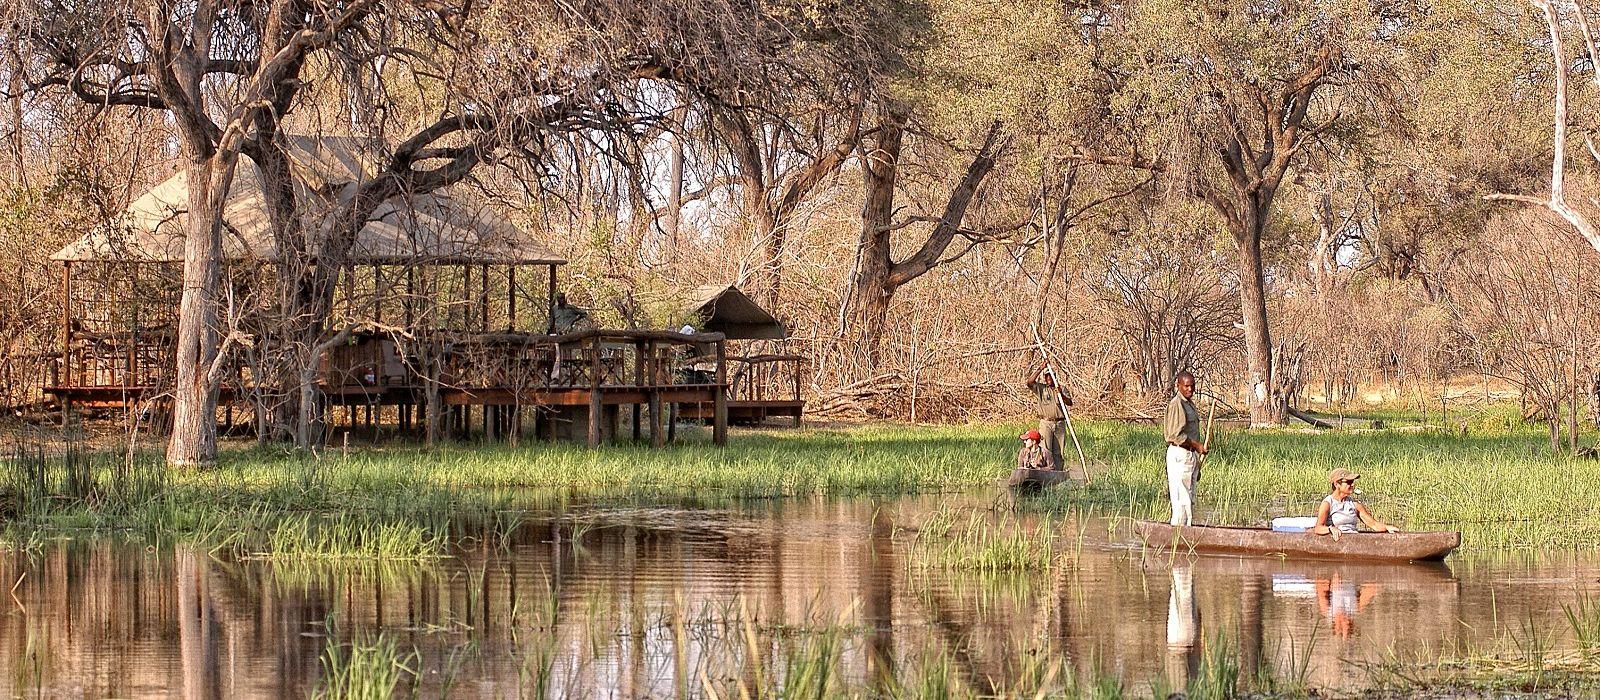 Safari Höhepunkte: Tansania, Simbabwe und Botswana Urlaub 2